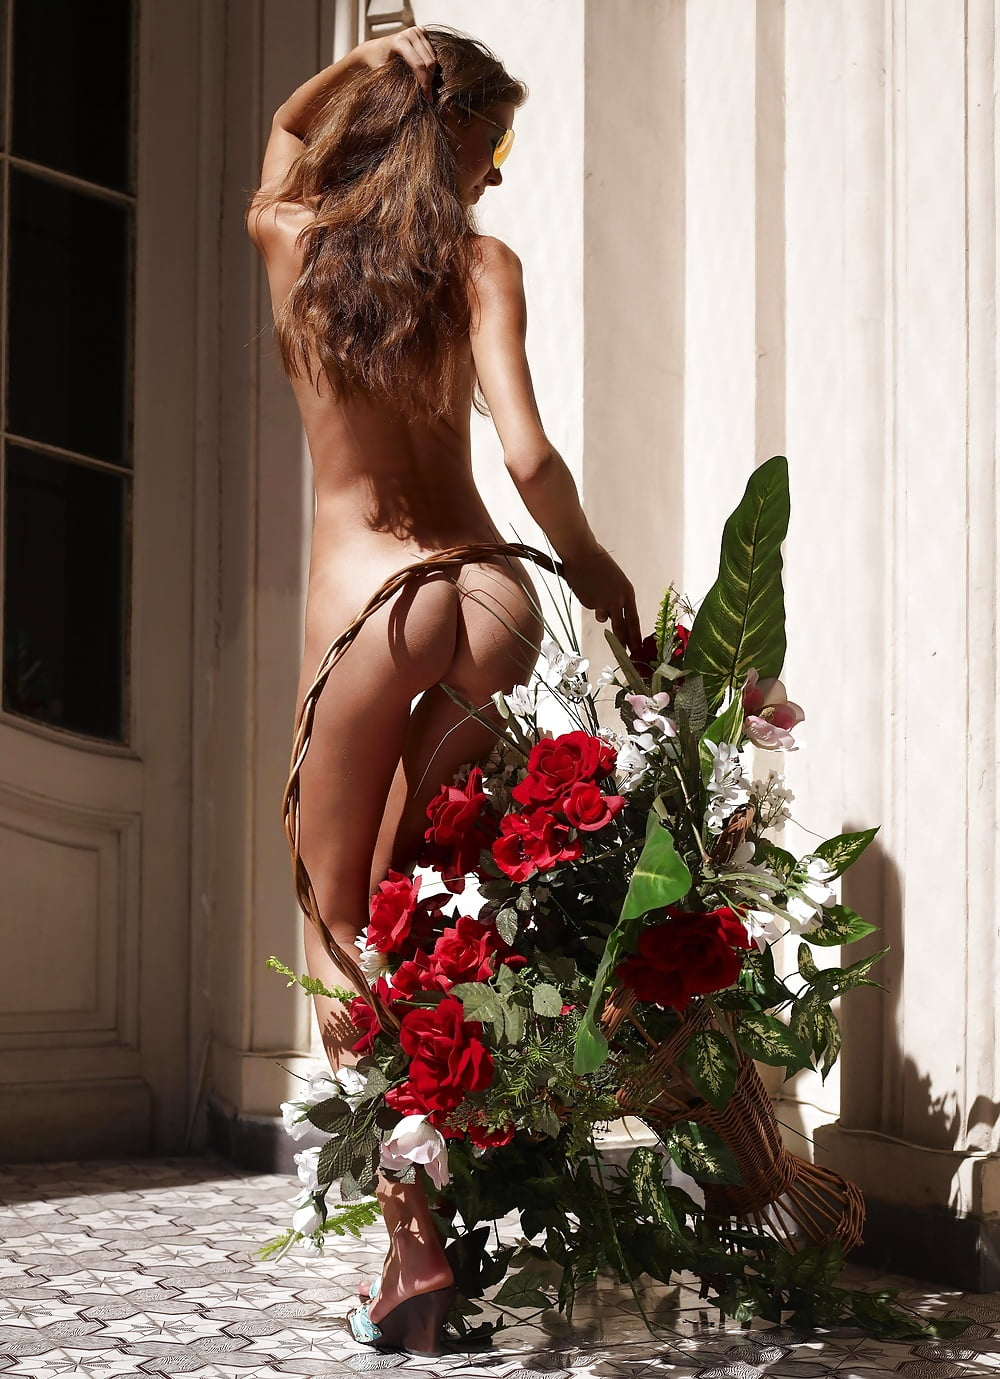 Erotic flowers pictures pron